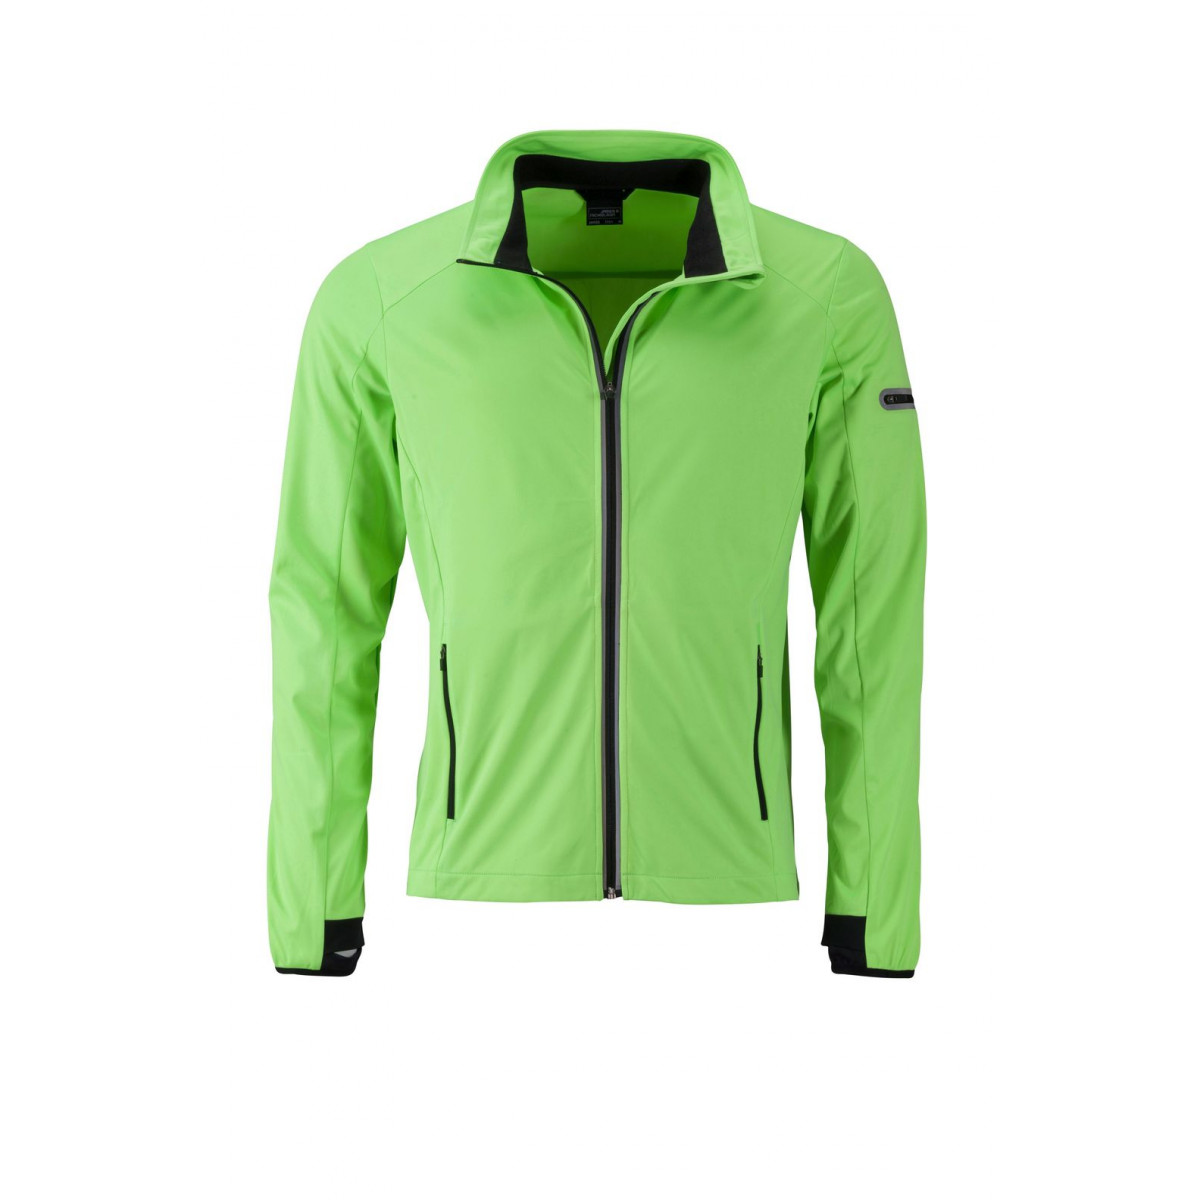 Куртка мужская JN1126 Mens Sports Softshell Jacket - Ярко-зеленый/Черный